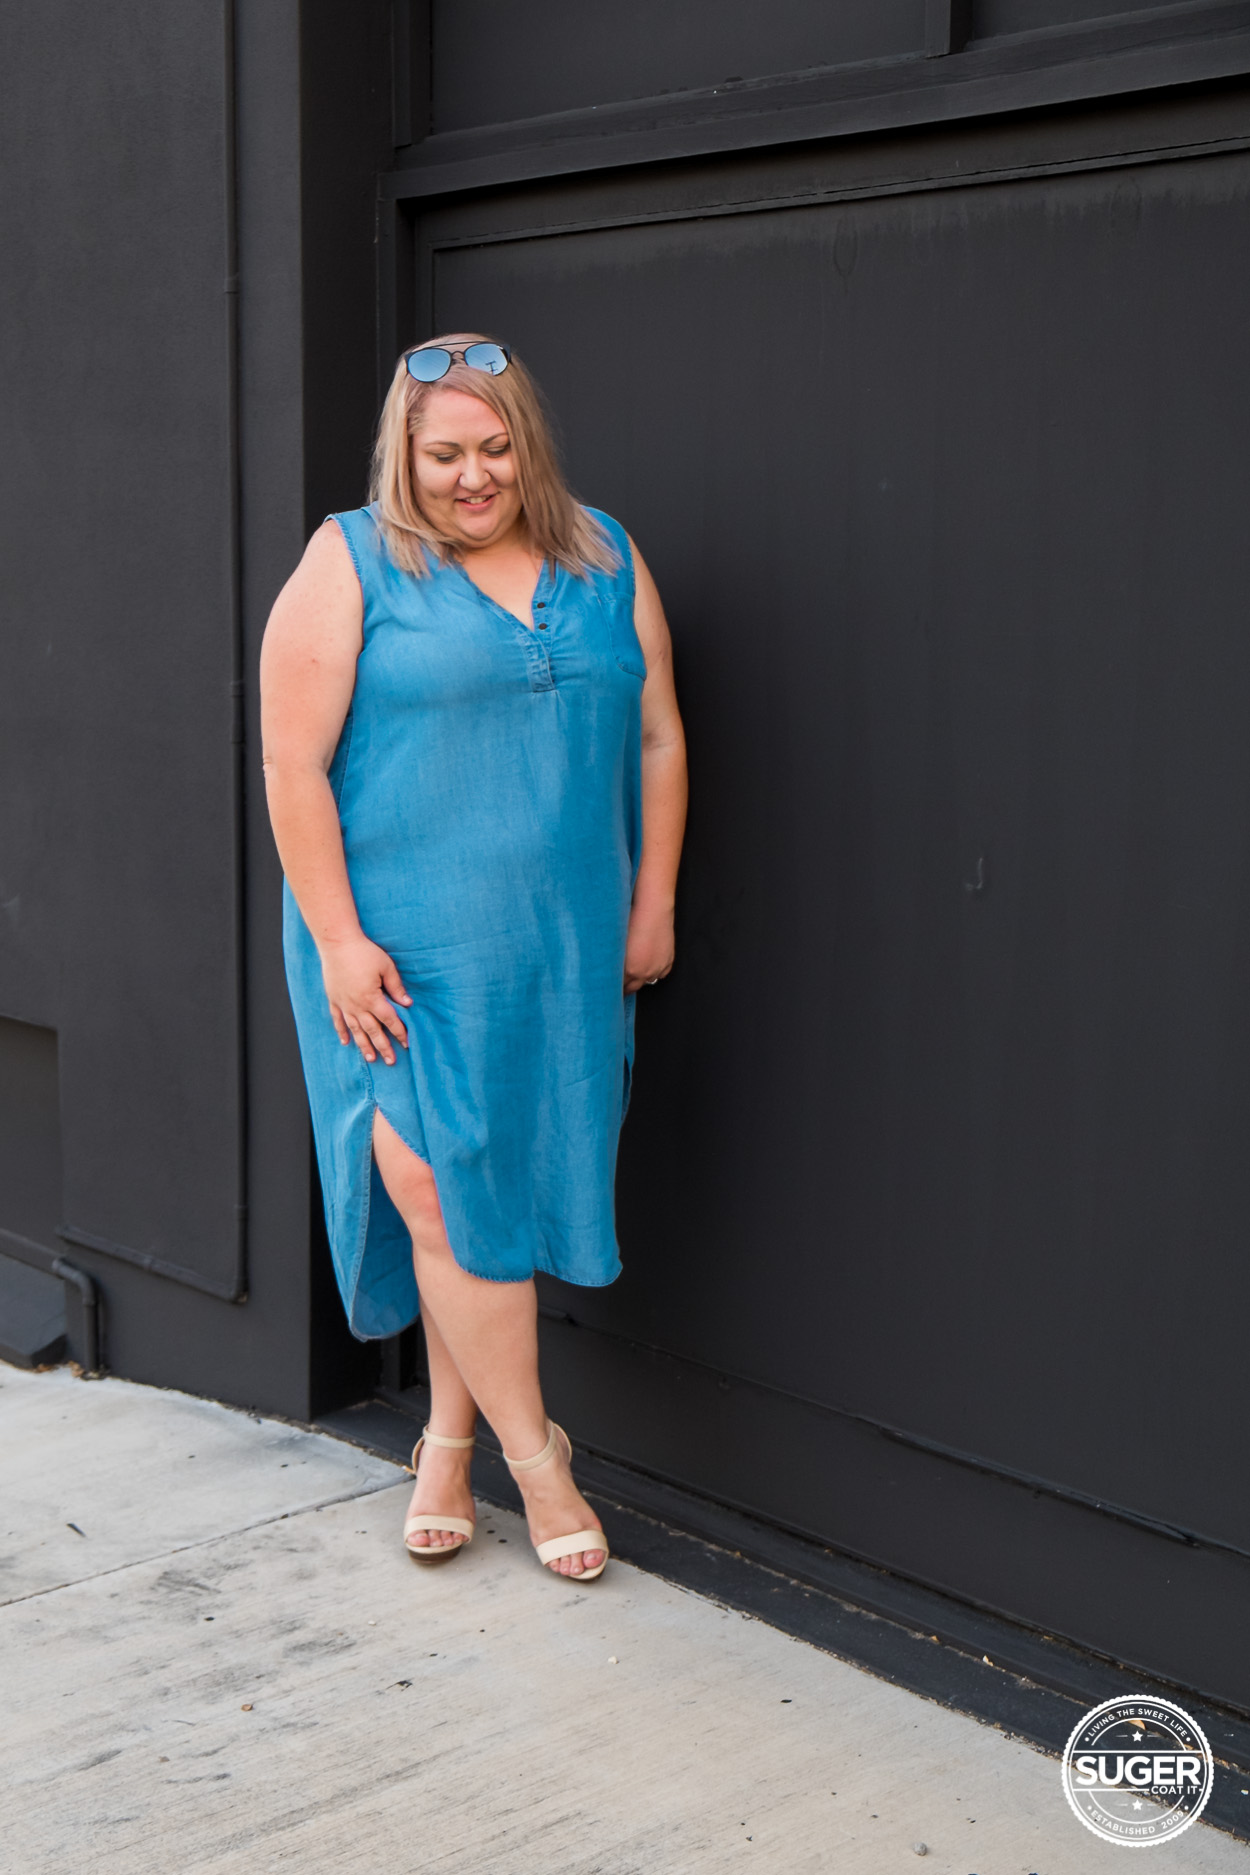 valentina-loves-david-jones-chambray-dress-plus-size-blogger-8